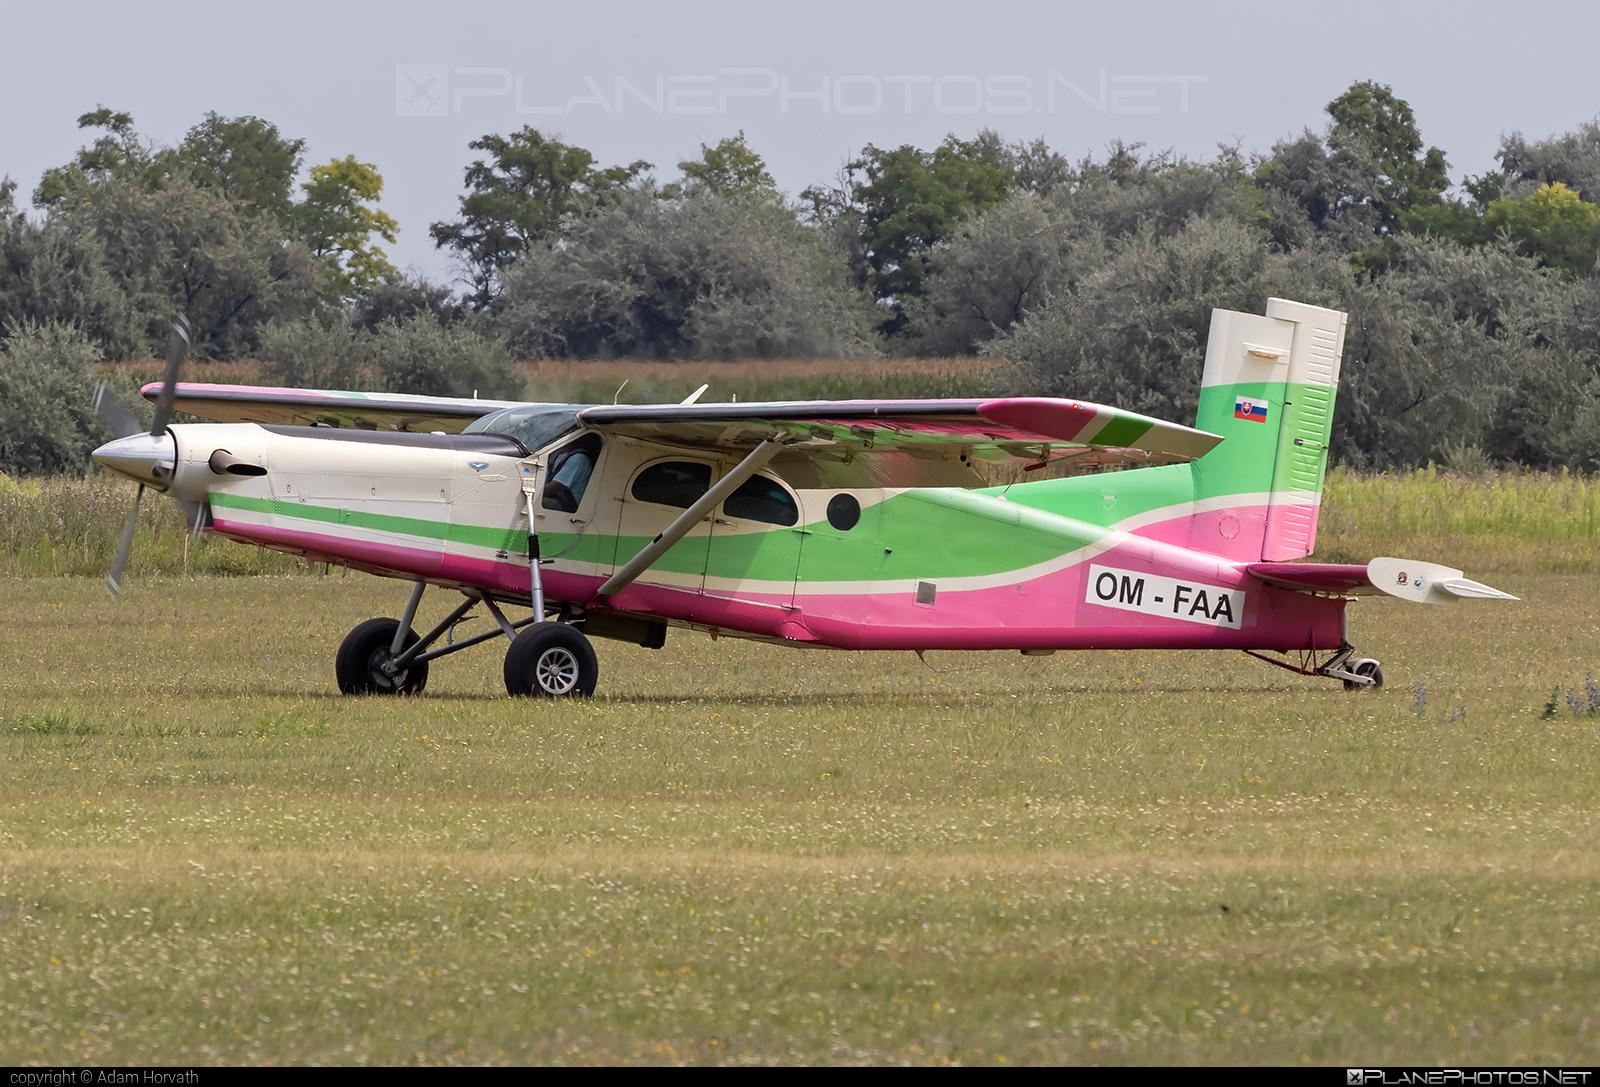 Pilatus PC-6/B2-H4 Turbo Porter - OM-FAA operated by FENIX AIR s.r.o #fenixair #fenixairsro #pilatus